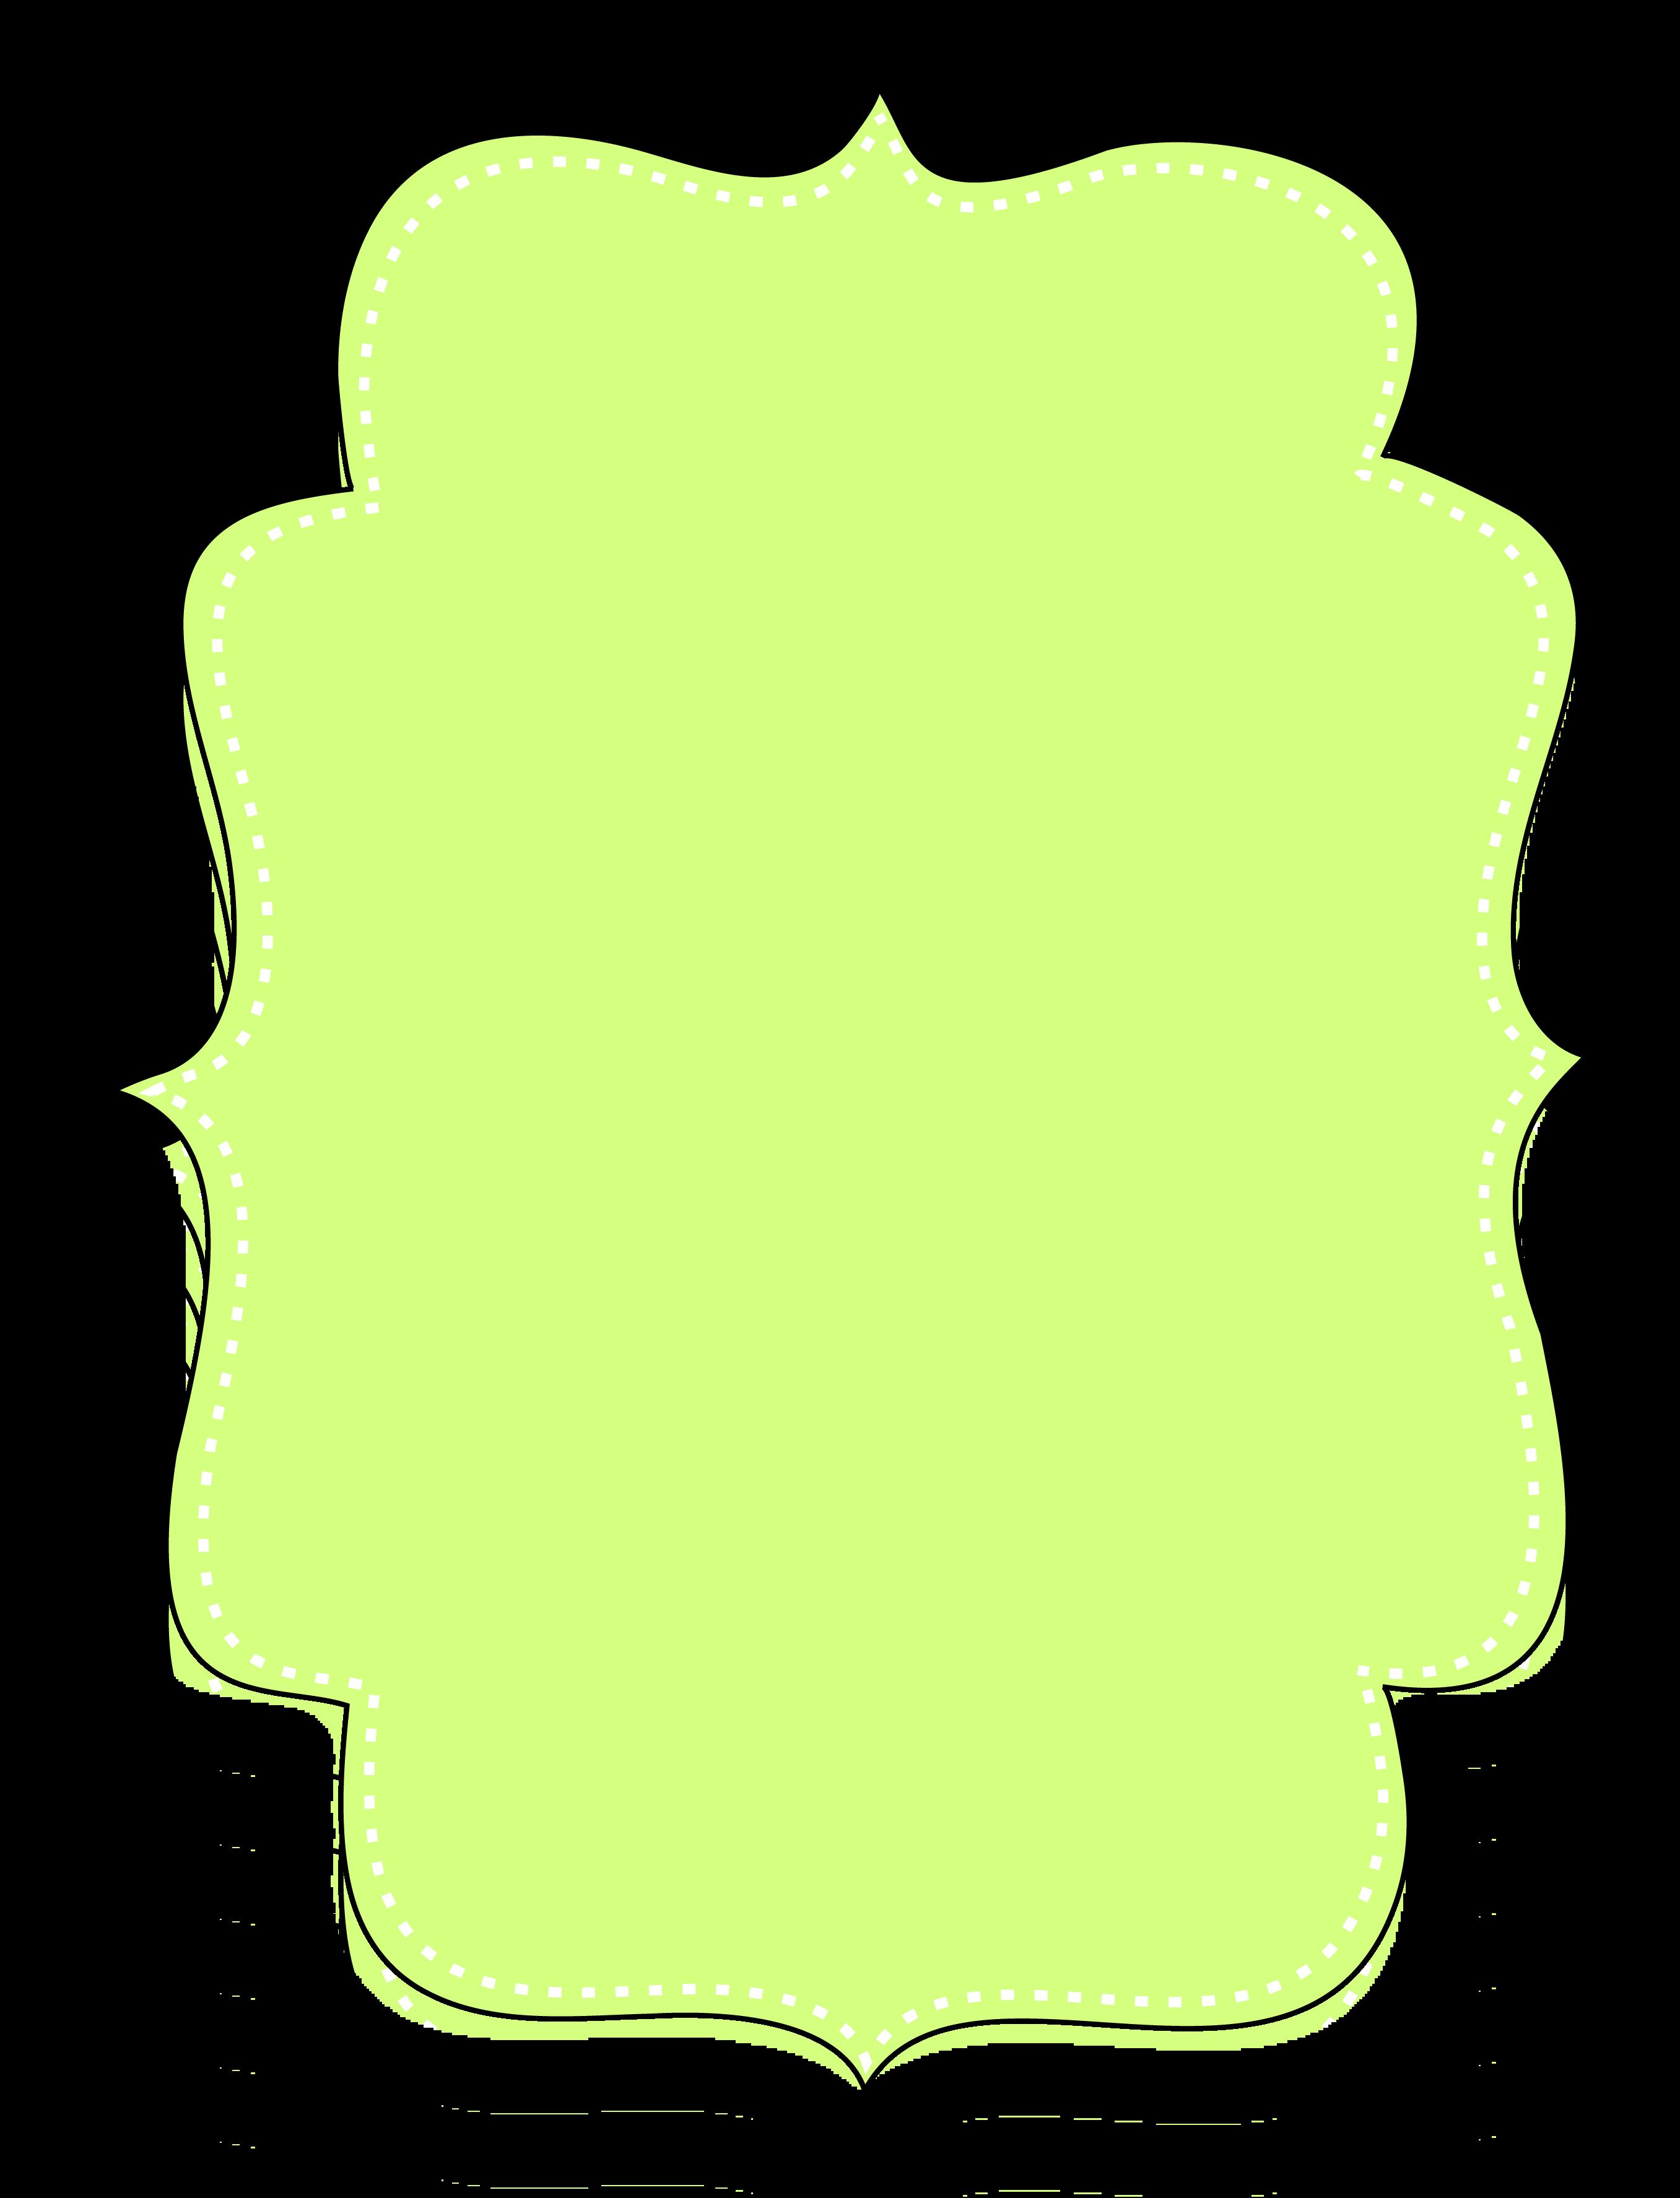 Pin by wafaa sherif. Cloud clipart label